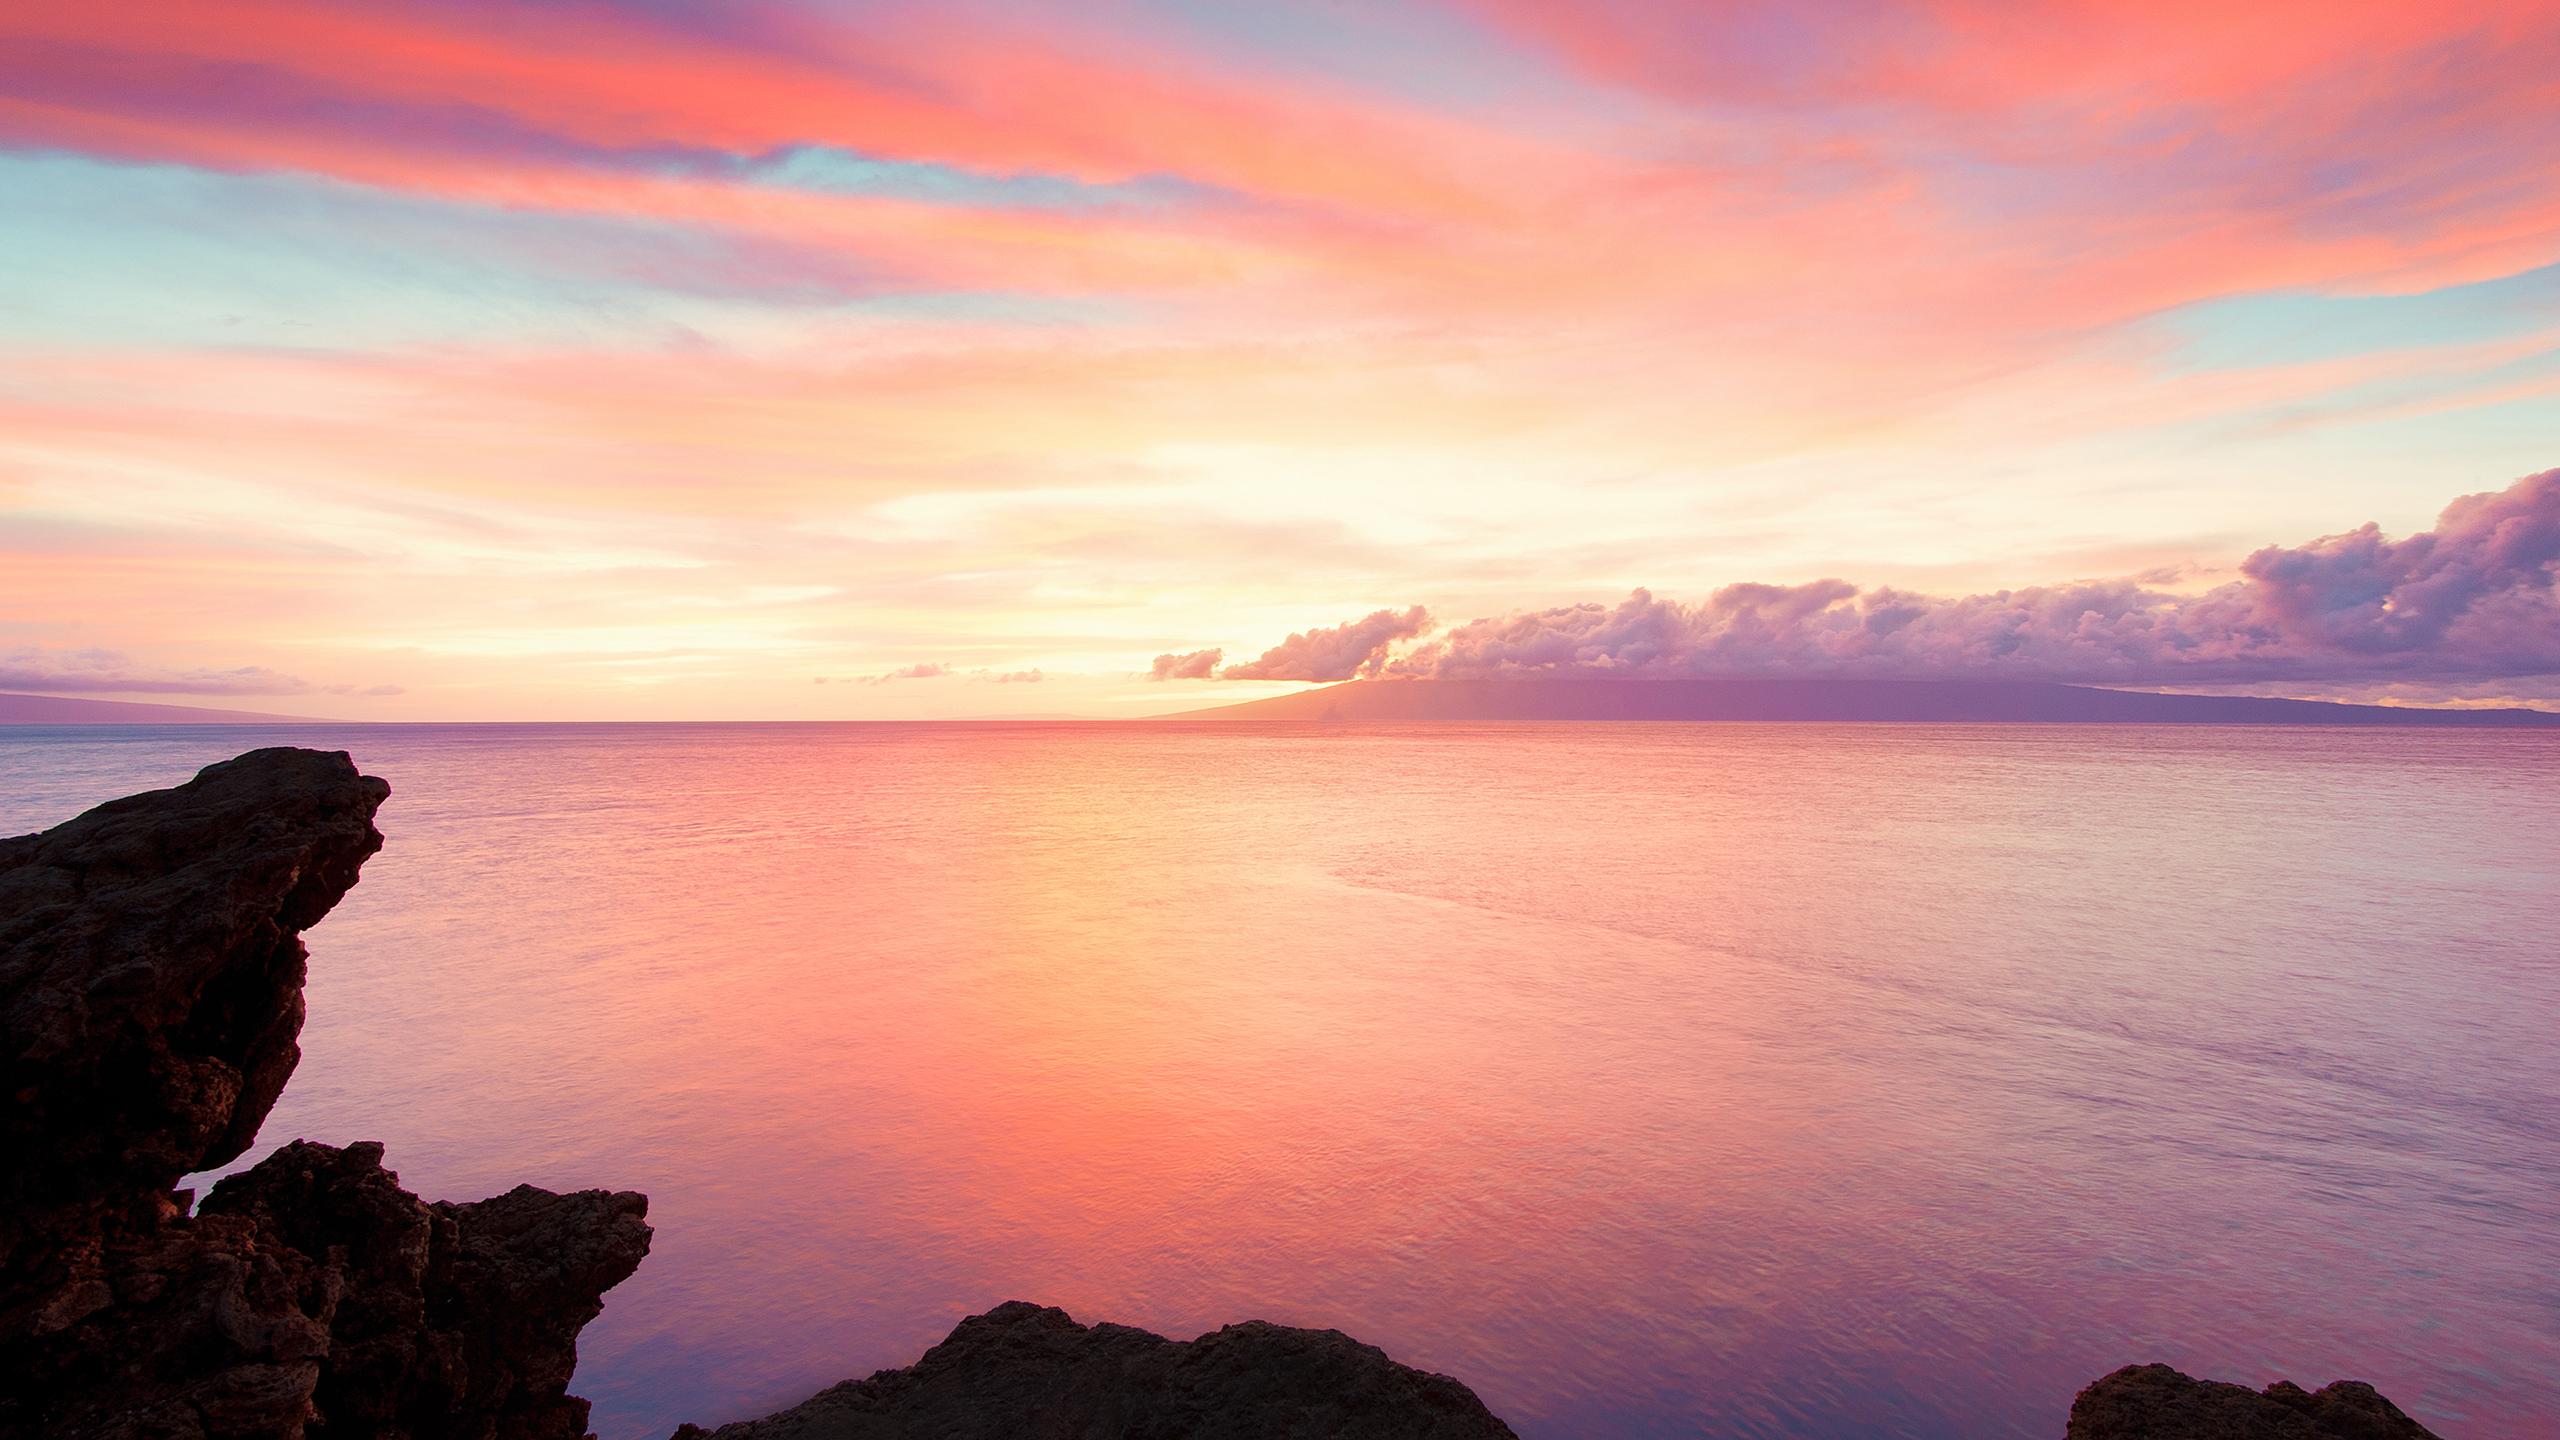 breathtakingly_stunning_view_hawaii_wallpaper_2560x1440